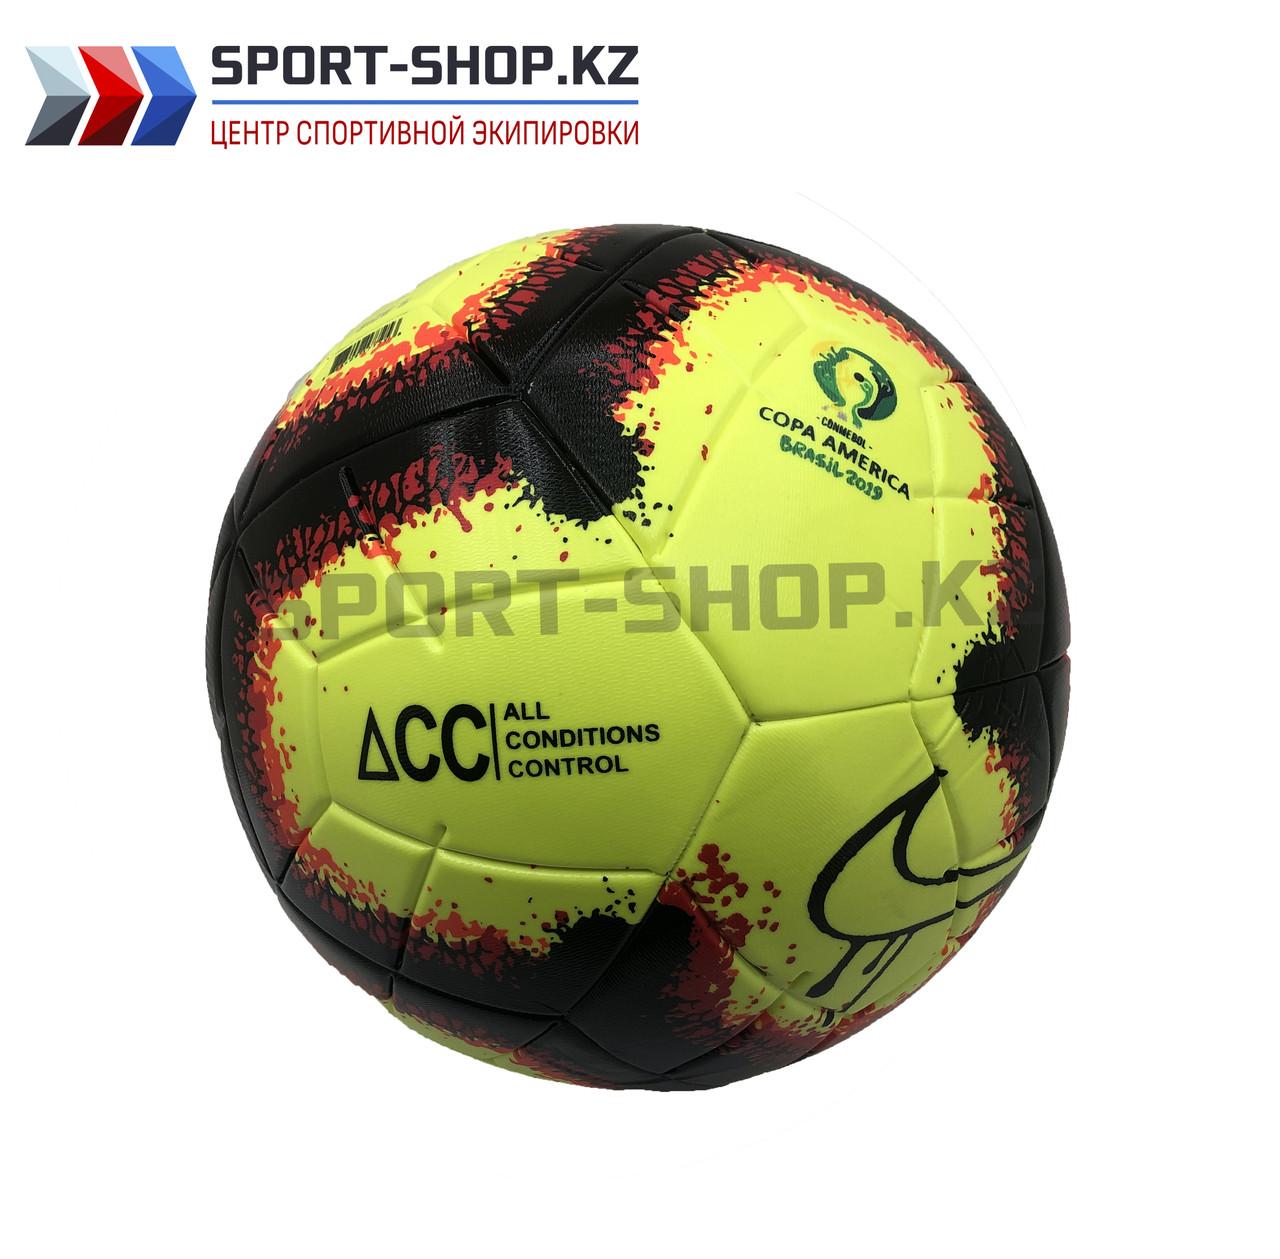 Футбольный мяч NIKE Strike Rabisco Copa America 2019